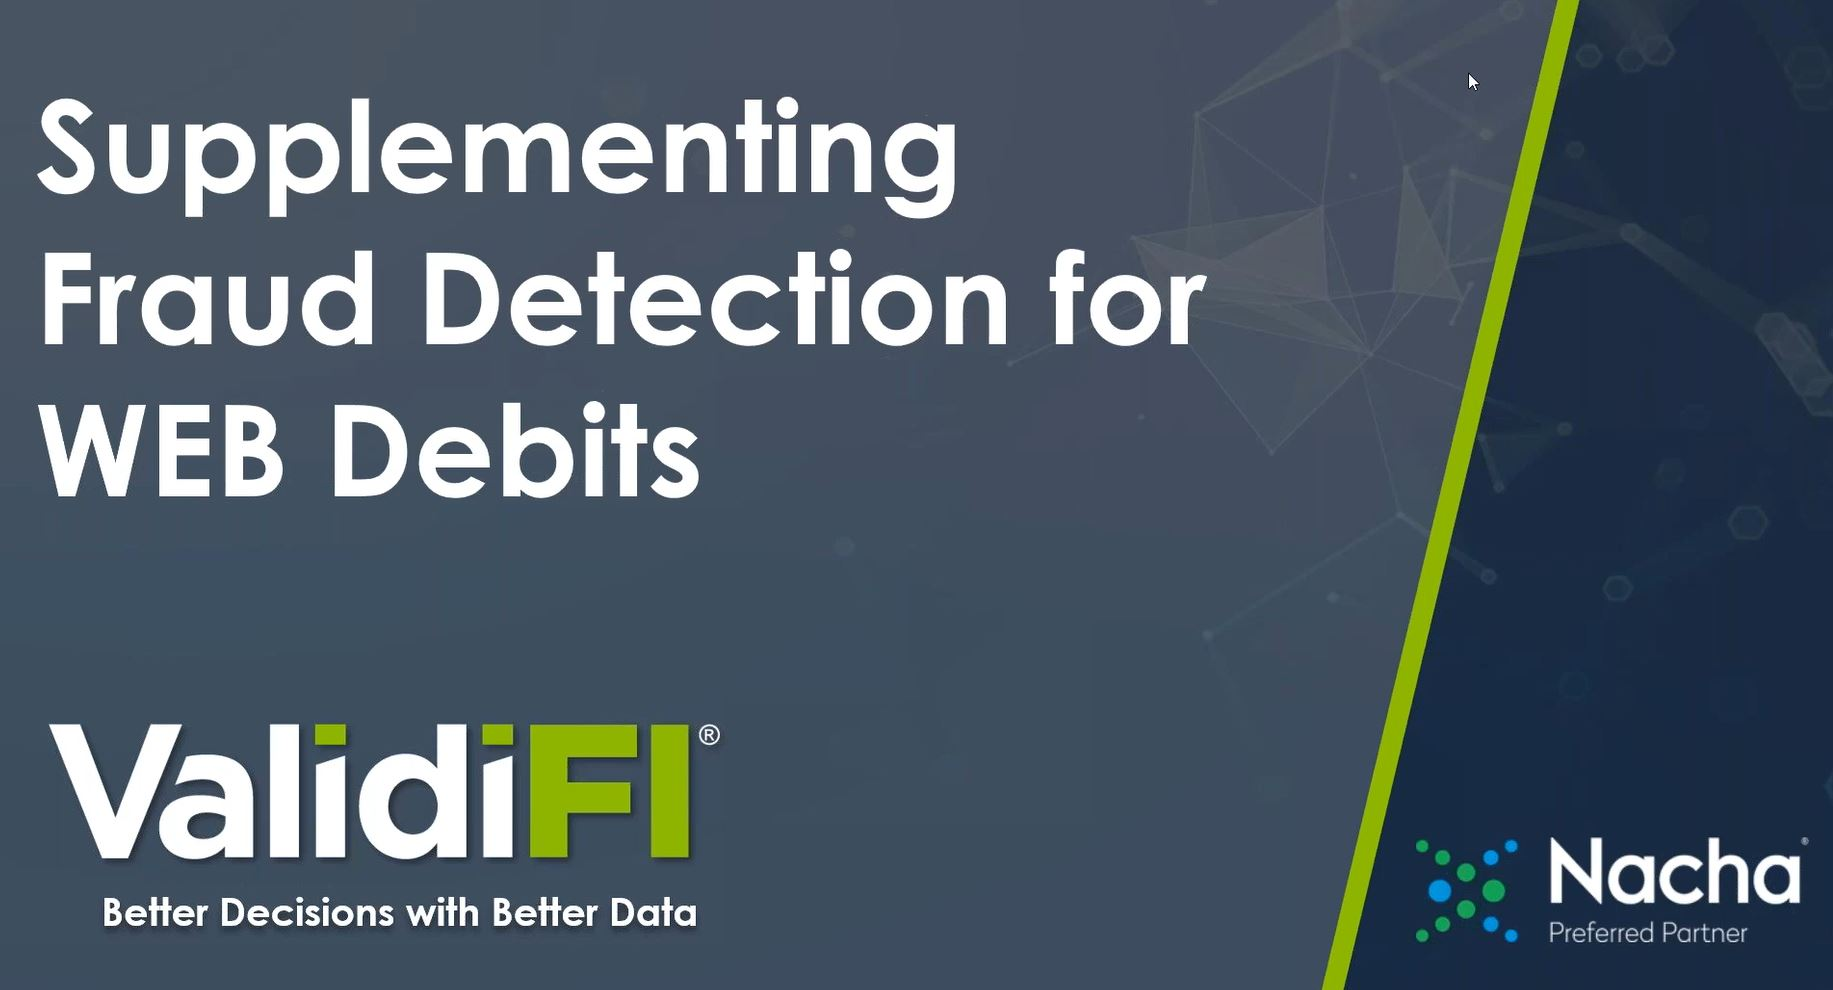 supplementing fraud detection for WEB debits - NACHA Webinar